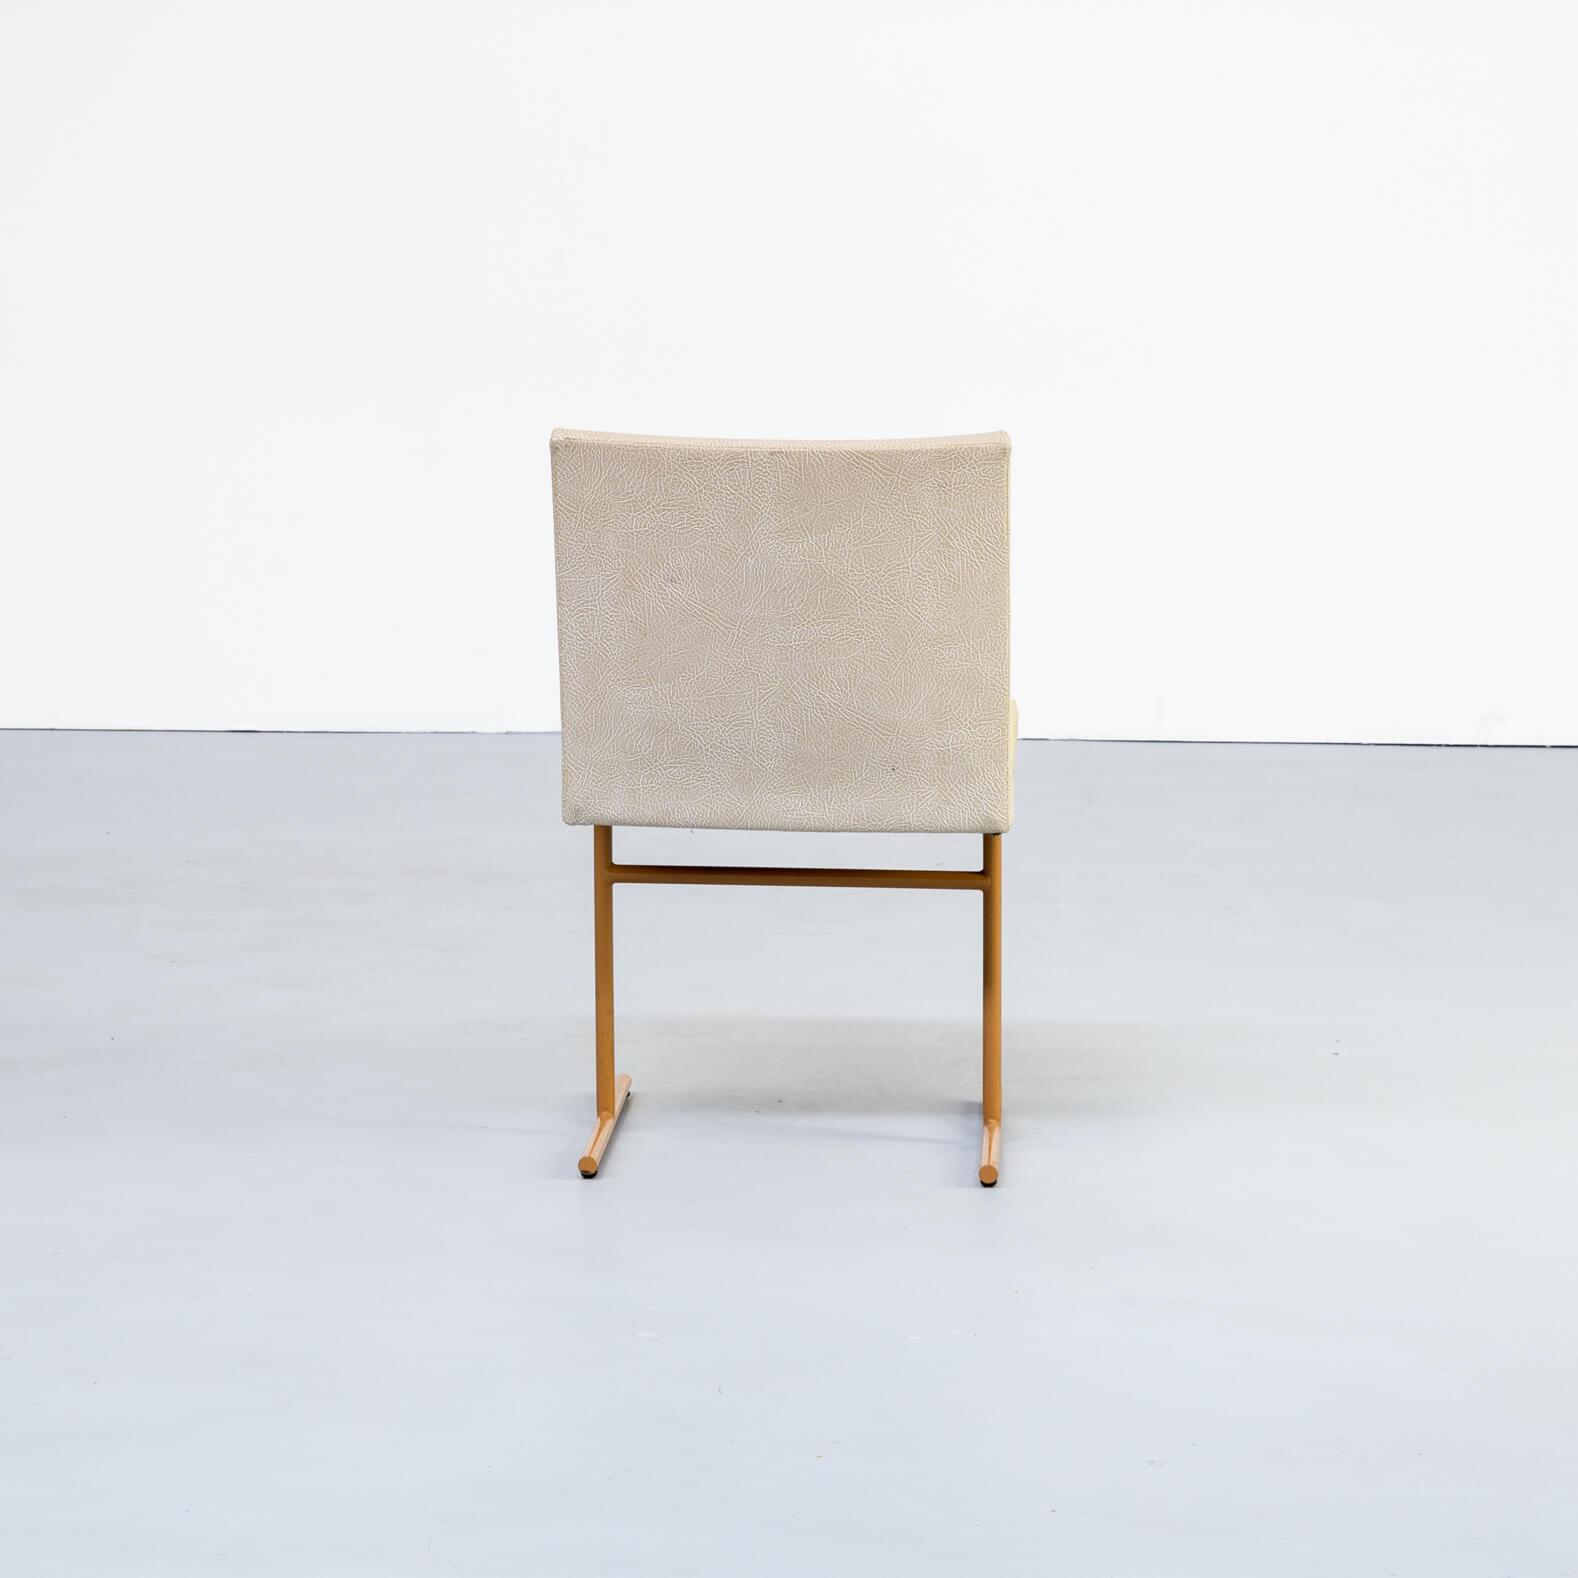 Eettafel Stoelen Modern.1970s Skai And Metal Postmodern Dining Chairs Set Of 6 For Sale